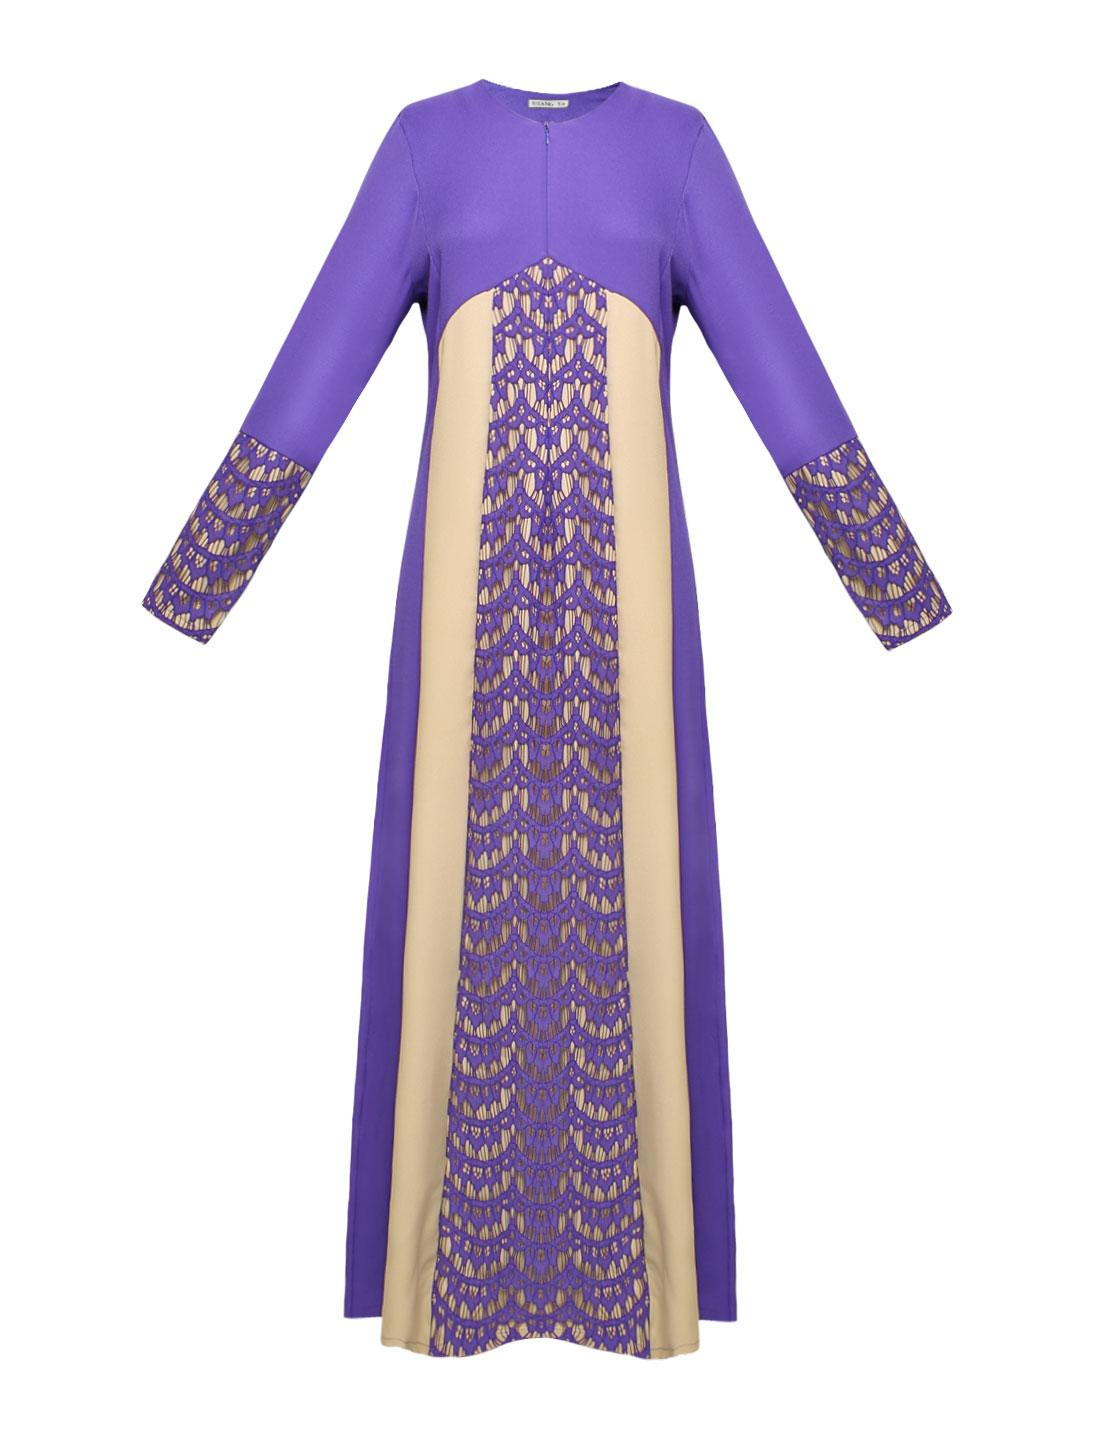 Women Lace Panel Contrast Color Long Sleeves Maxi Dress Purple S